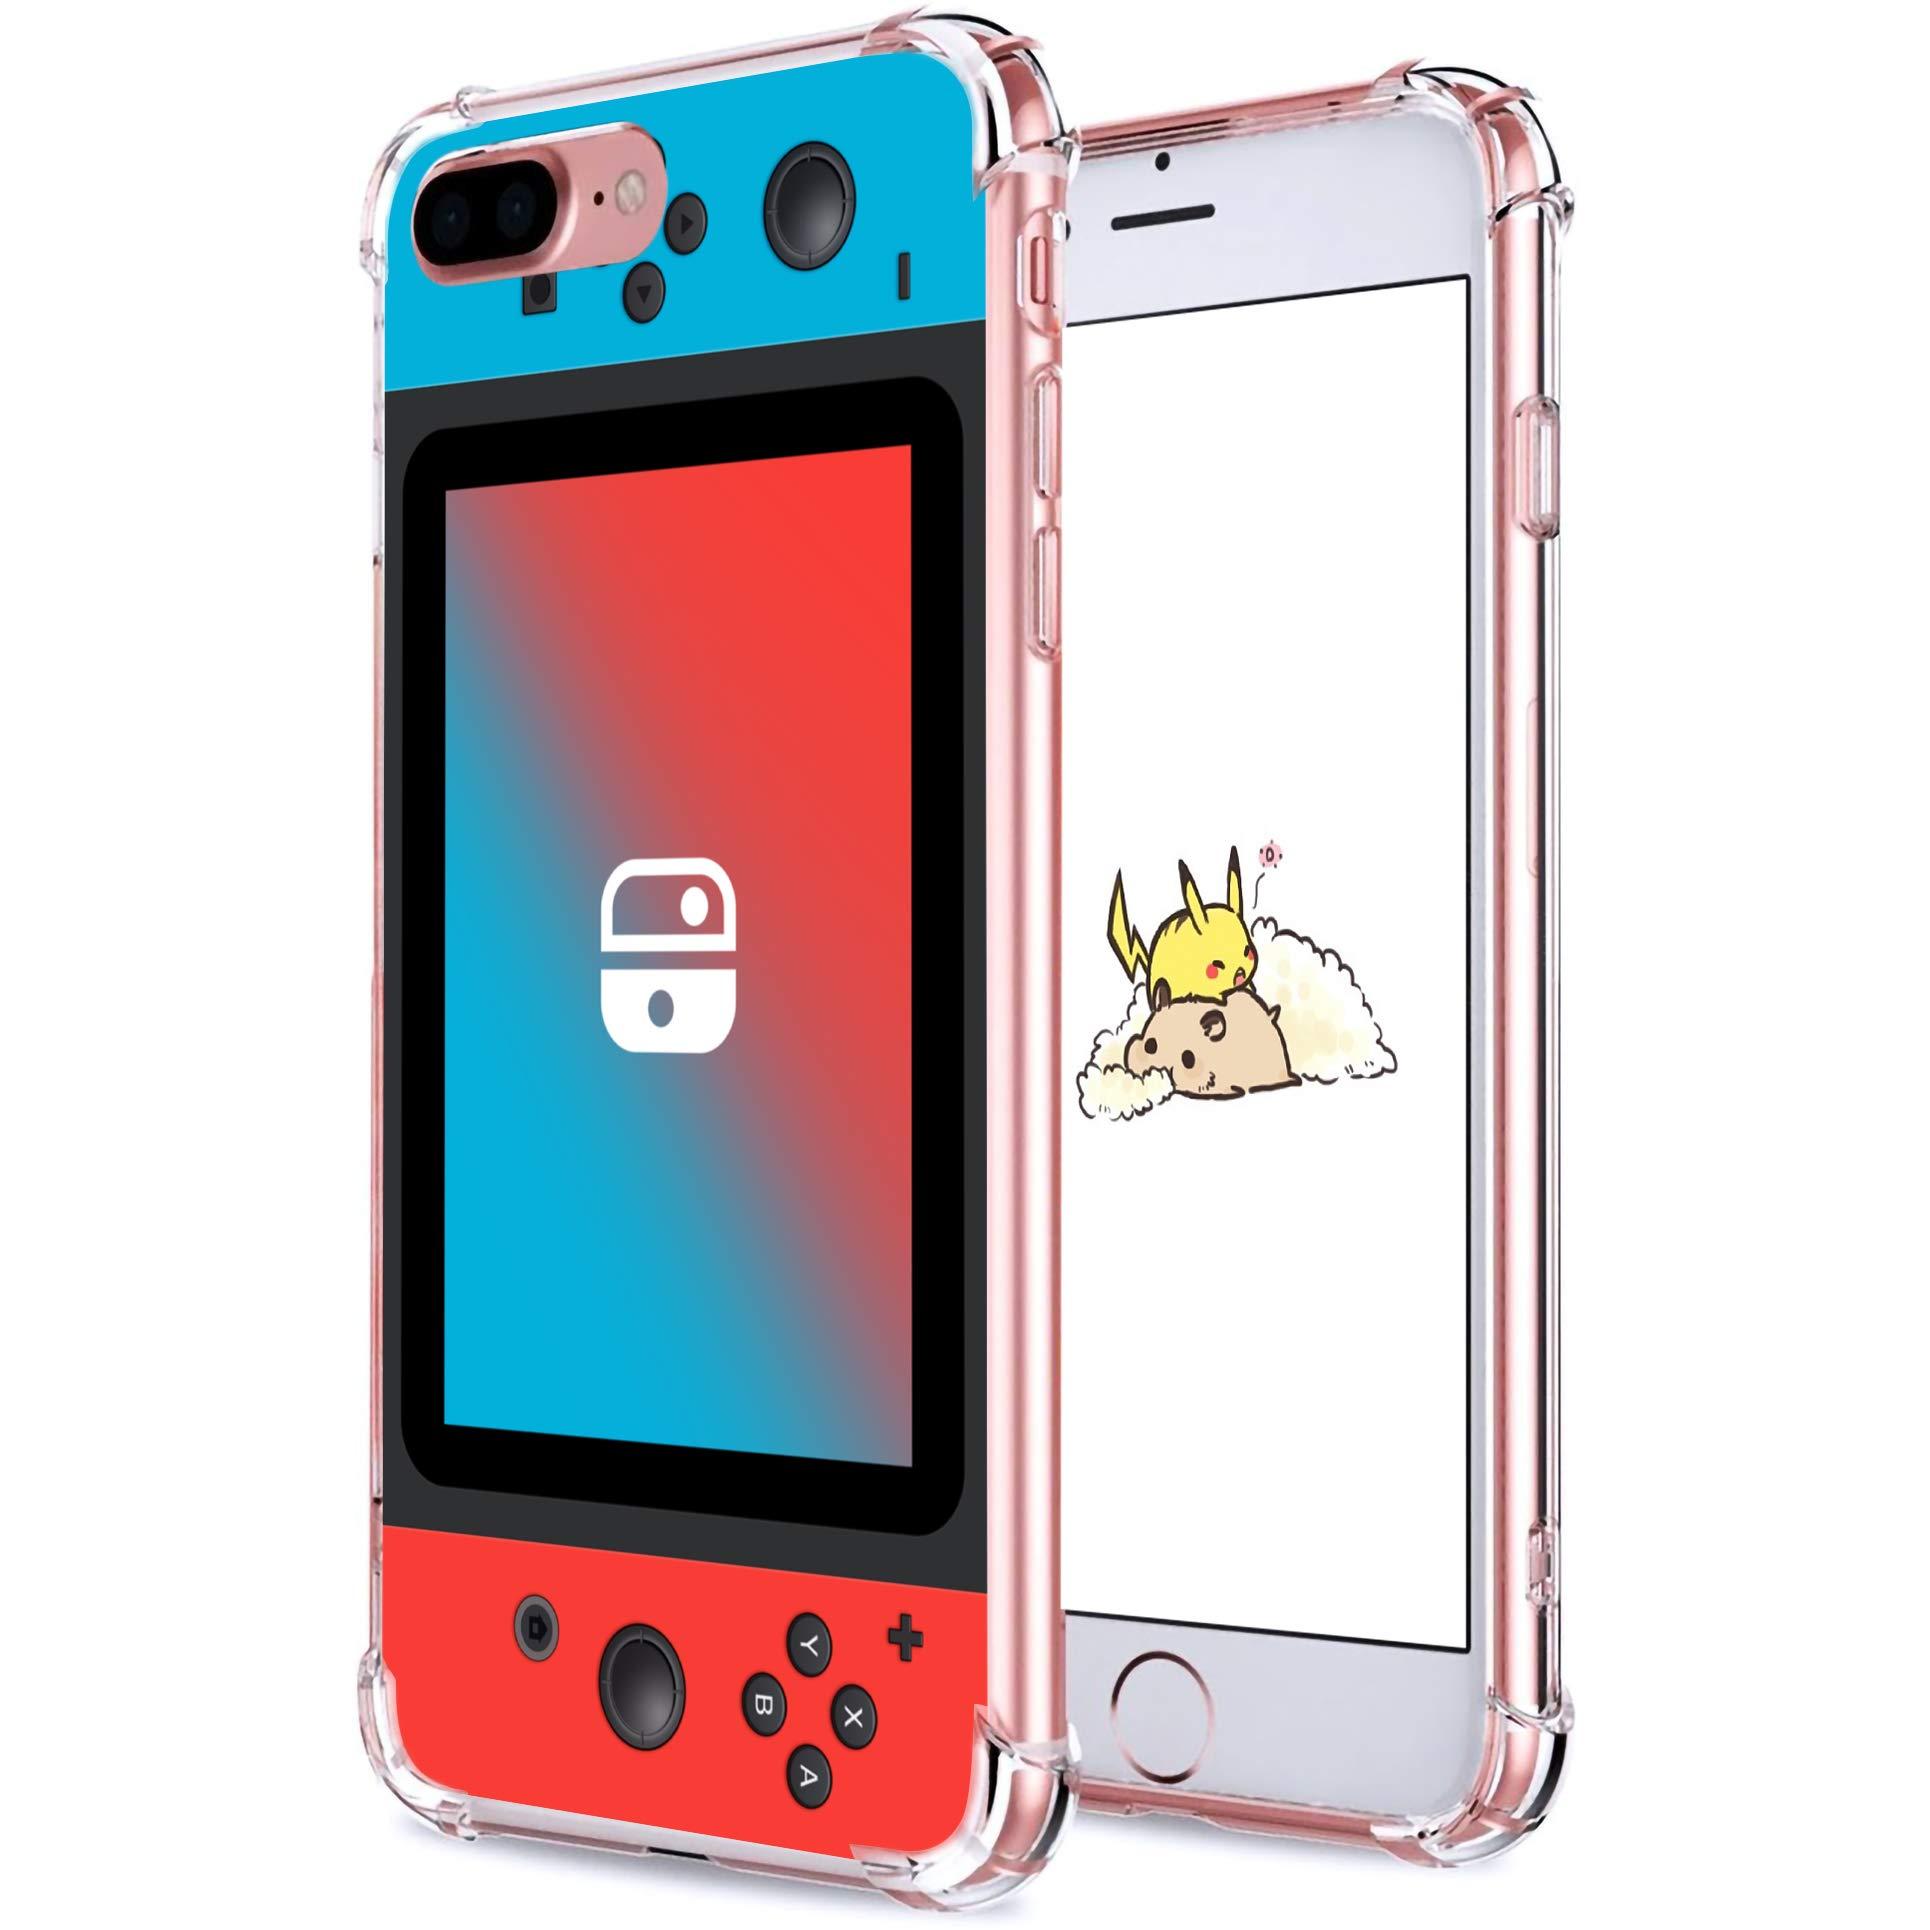 "Coralogo for iPhone 7 Plus/ 8 Plus TPU Case, Cute Funny Cartoon Design Slim Ultra Clear Protective Fashion Fun Cool Soft Cover Skin Teens Kids Girls Cases for iPhone 8 Plus/7 Plus 5.5"" (Blue Red Games"